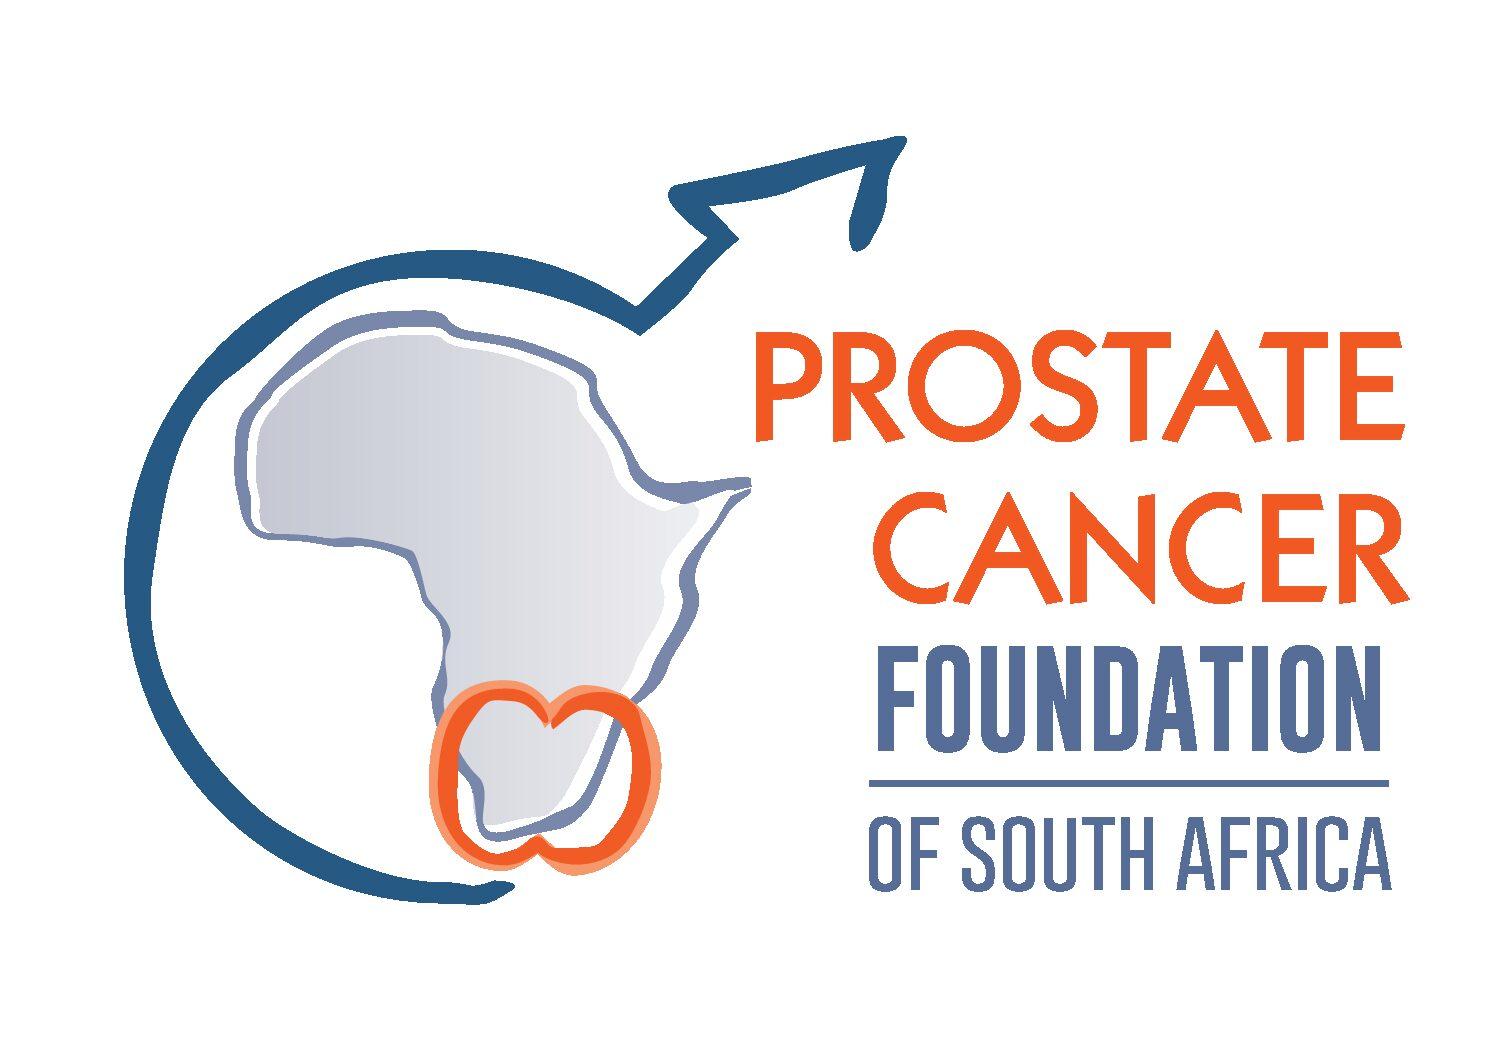 Prostate Cancer Foundation NPC